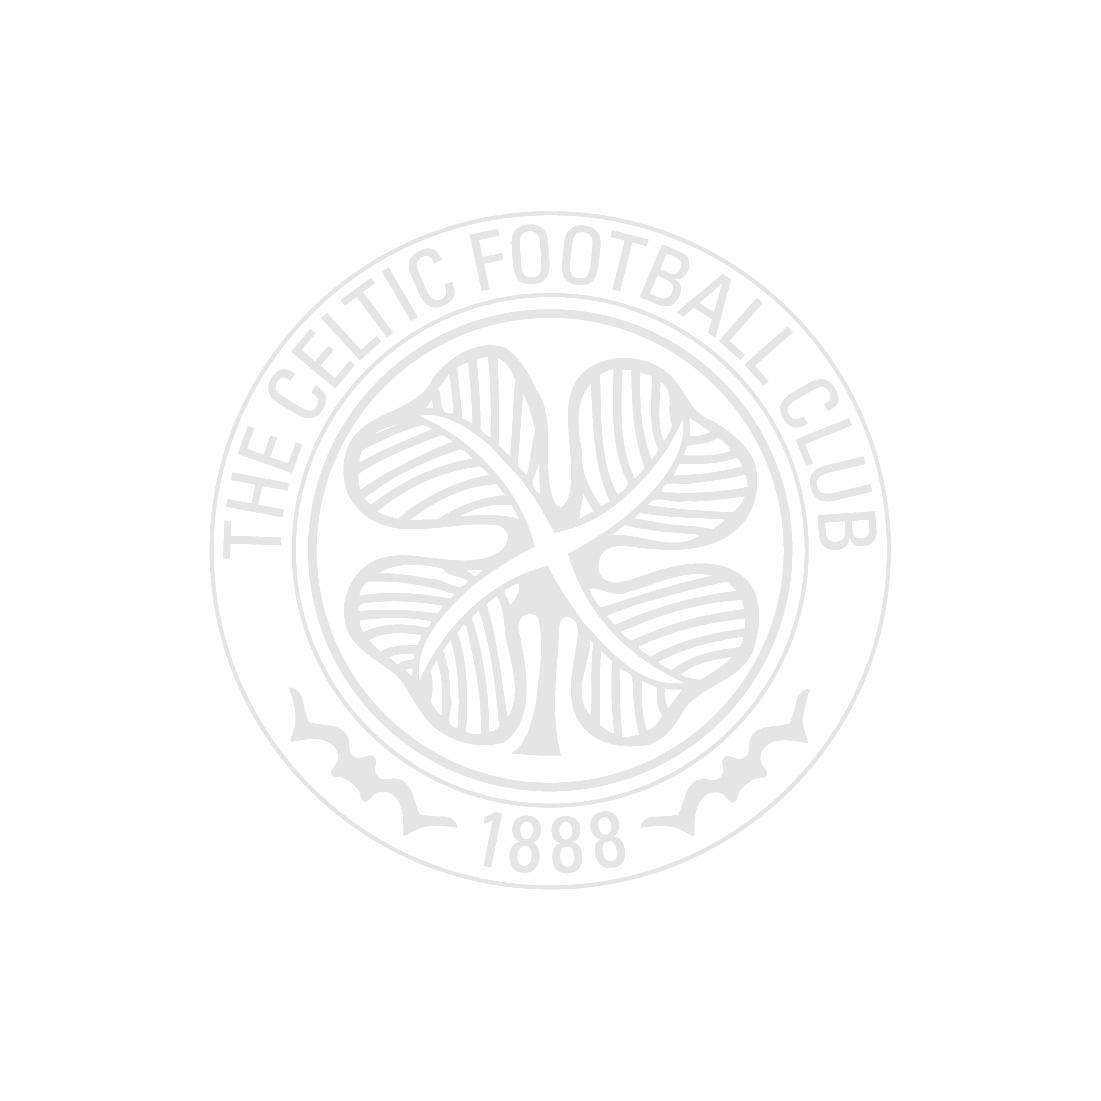 Celtic 20/21 Away Kit Pin Badge